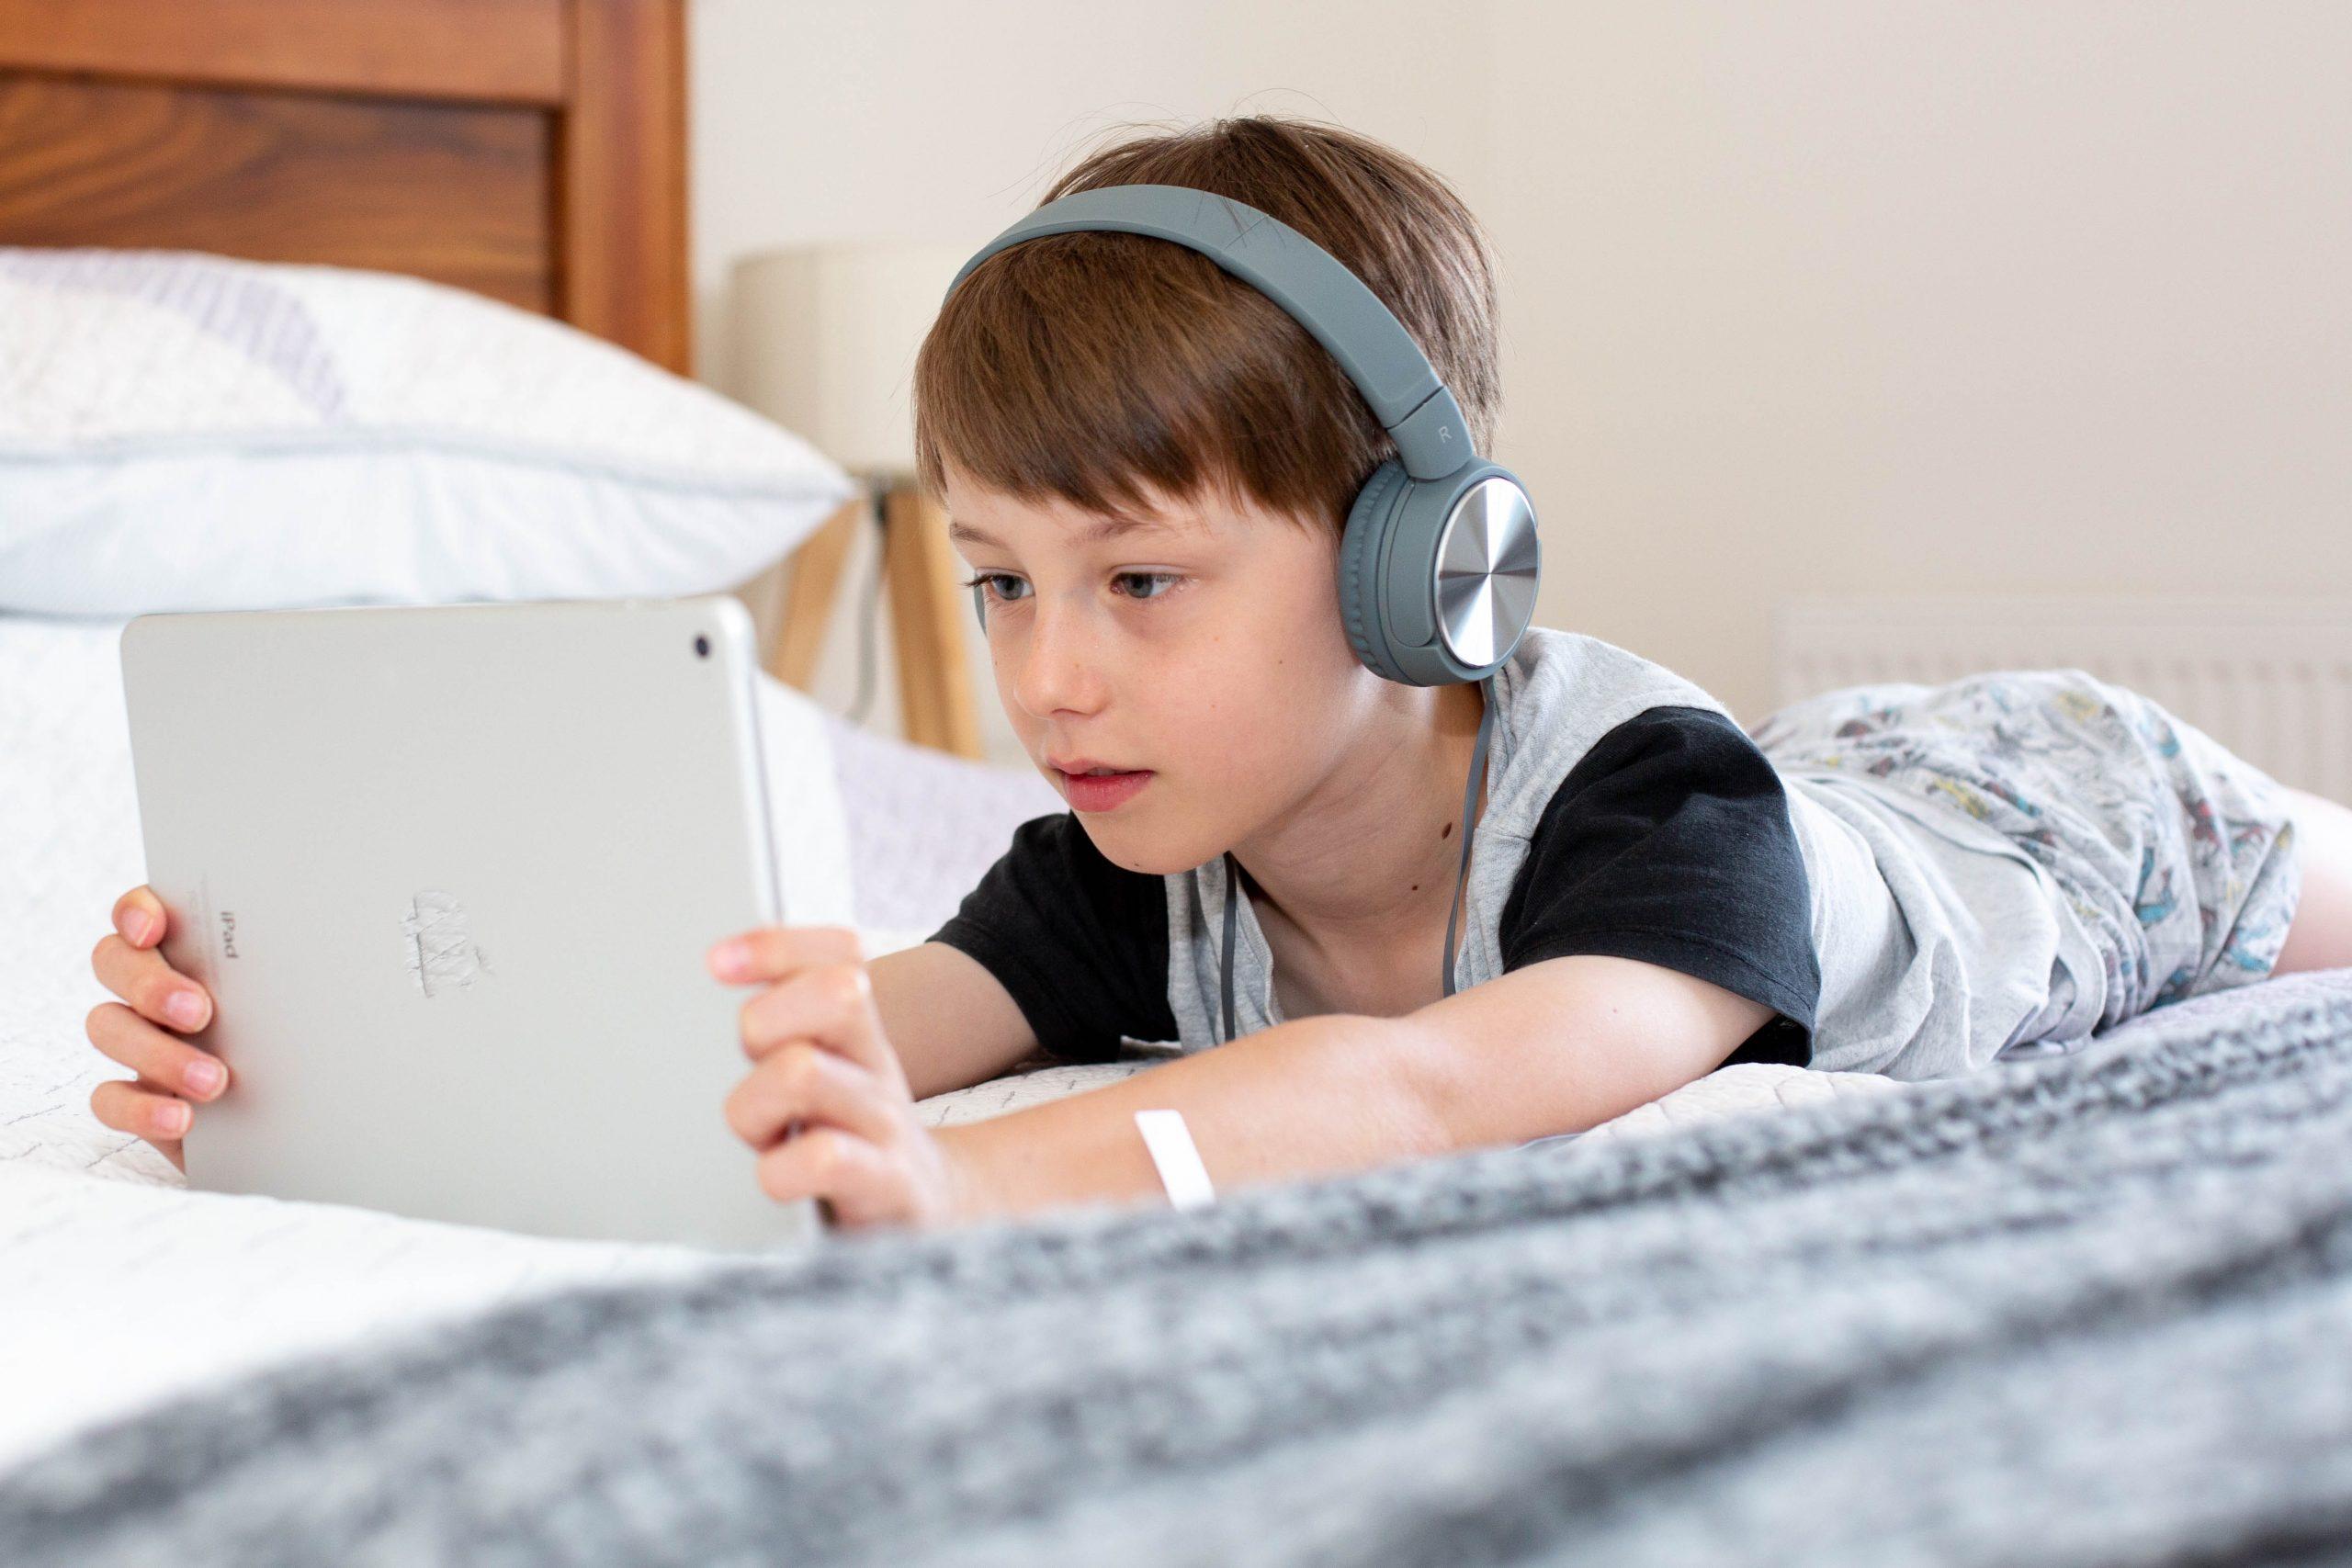 Part 2: Our Sex-Crazed Culture is Devouring Our Kids